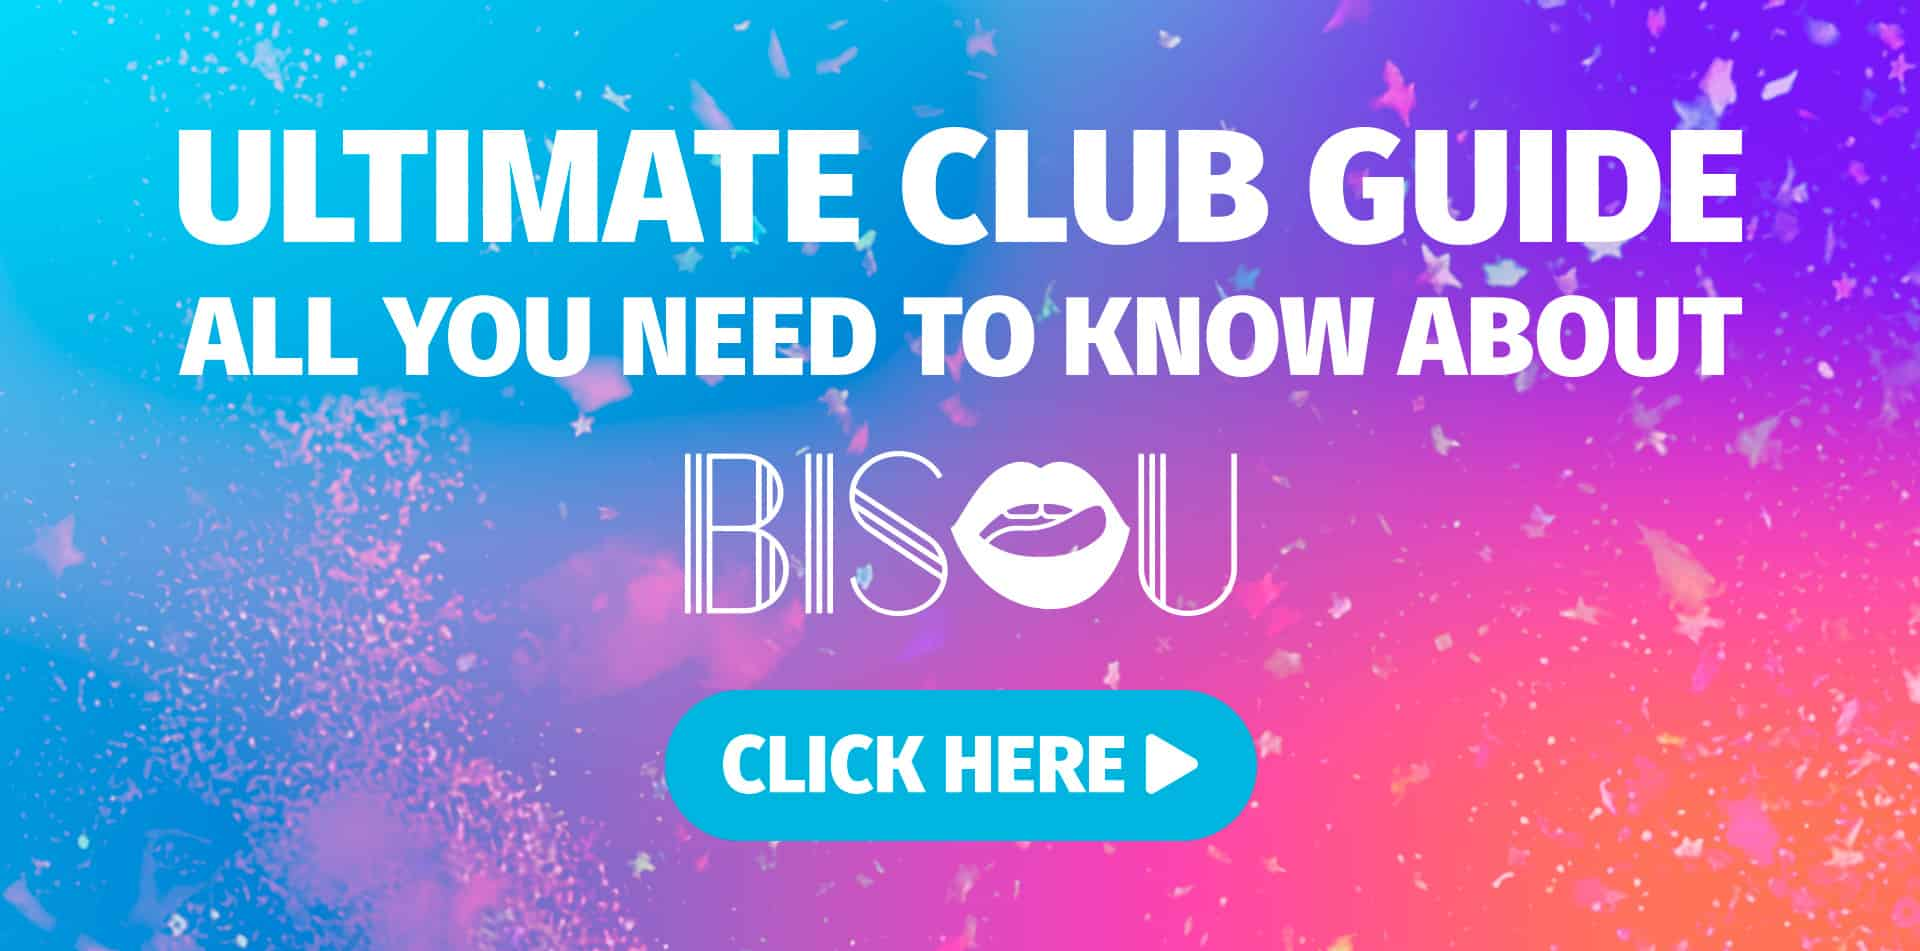 Ultimate Club Guide - Bisou Madrid